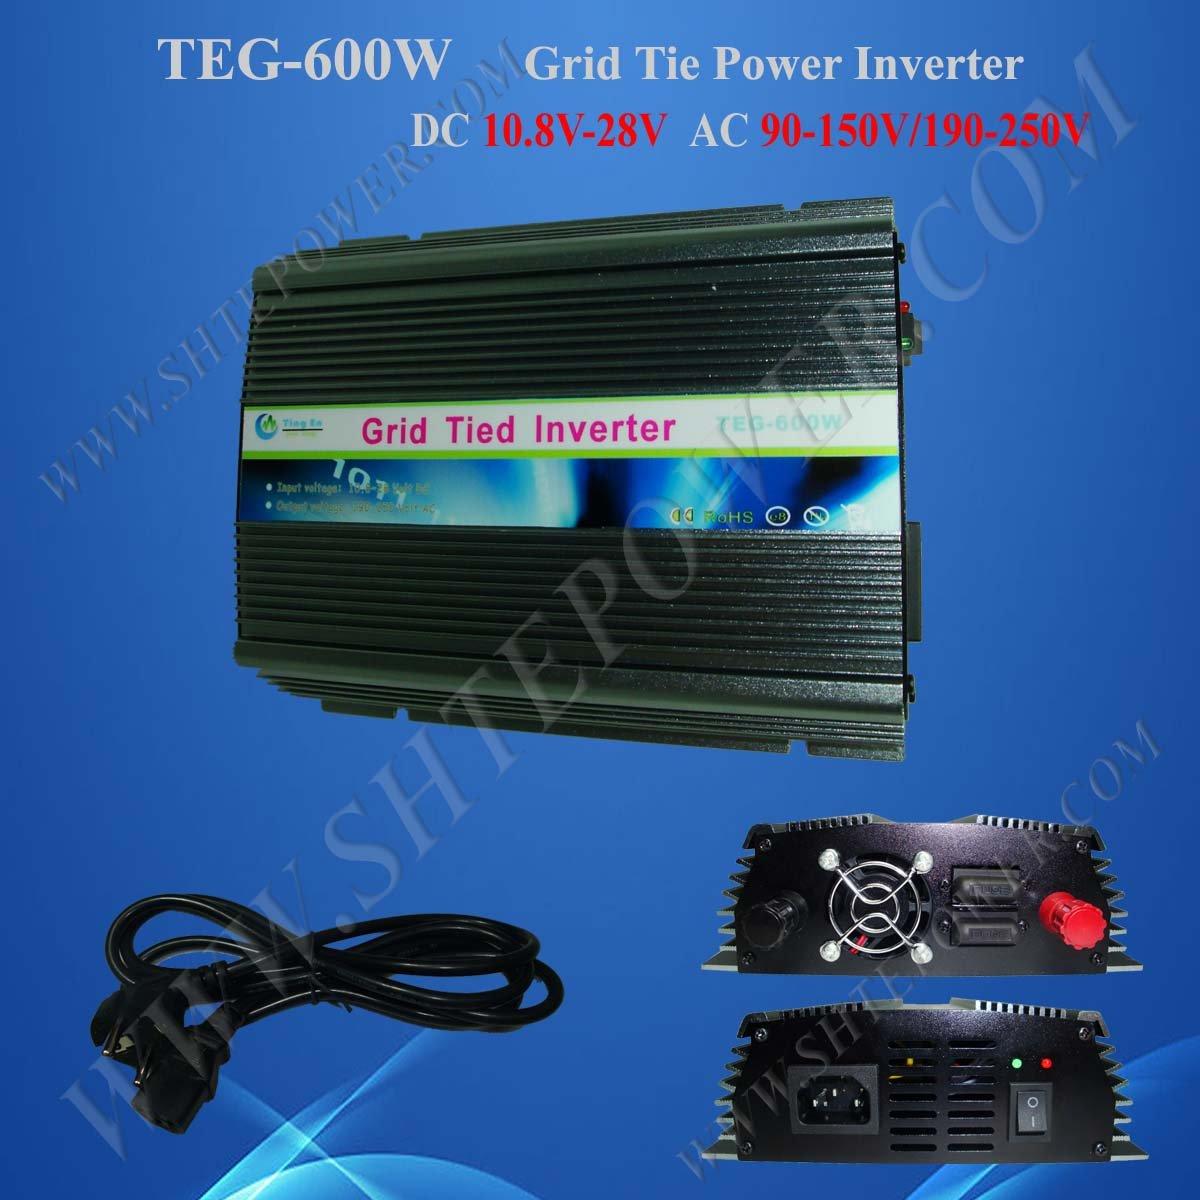 600w grid tie inverter 600 watts tie grid solar inverter dc 10.8-28v to ac 100v inverter solar(China (Mainland))